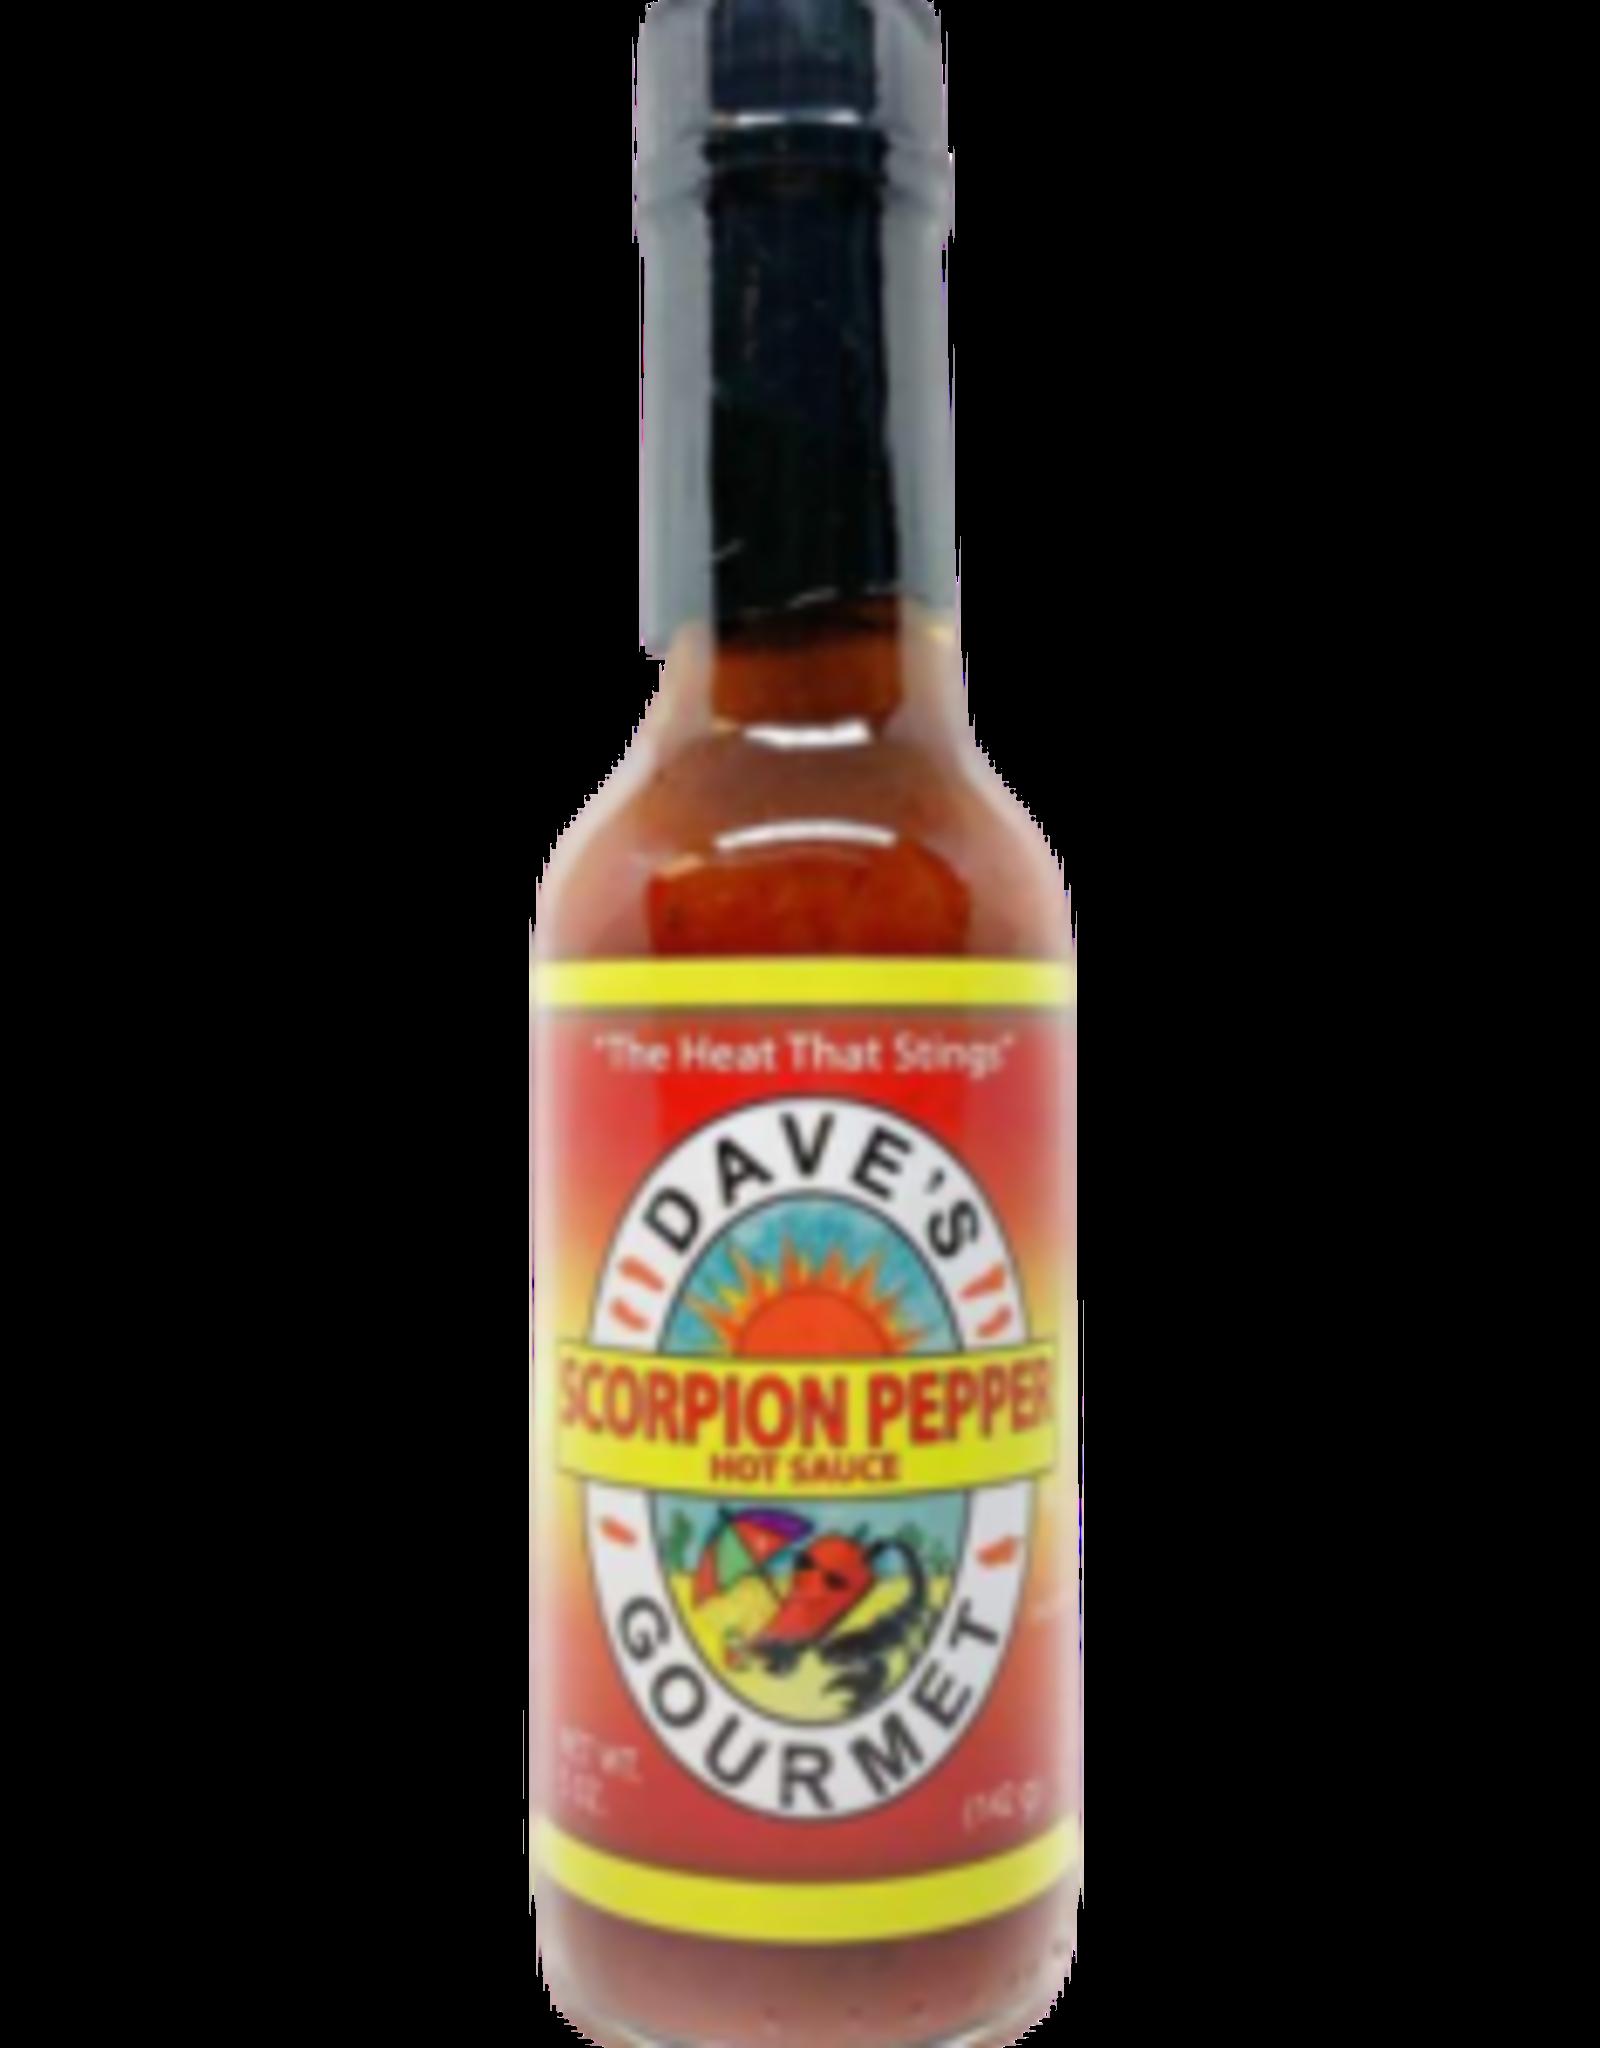 Dave's Gourmet Scorpion Pepper